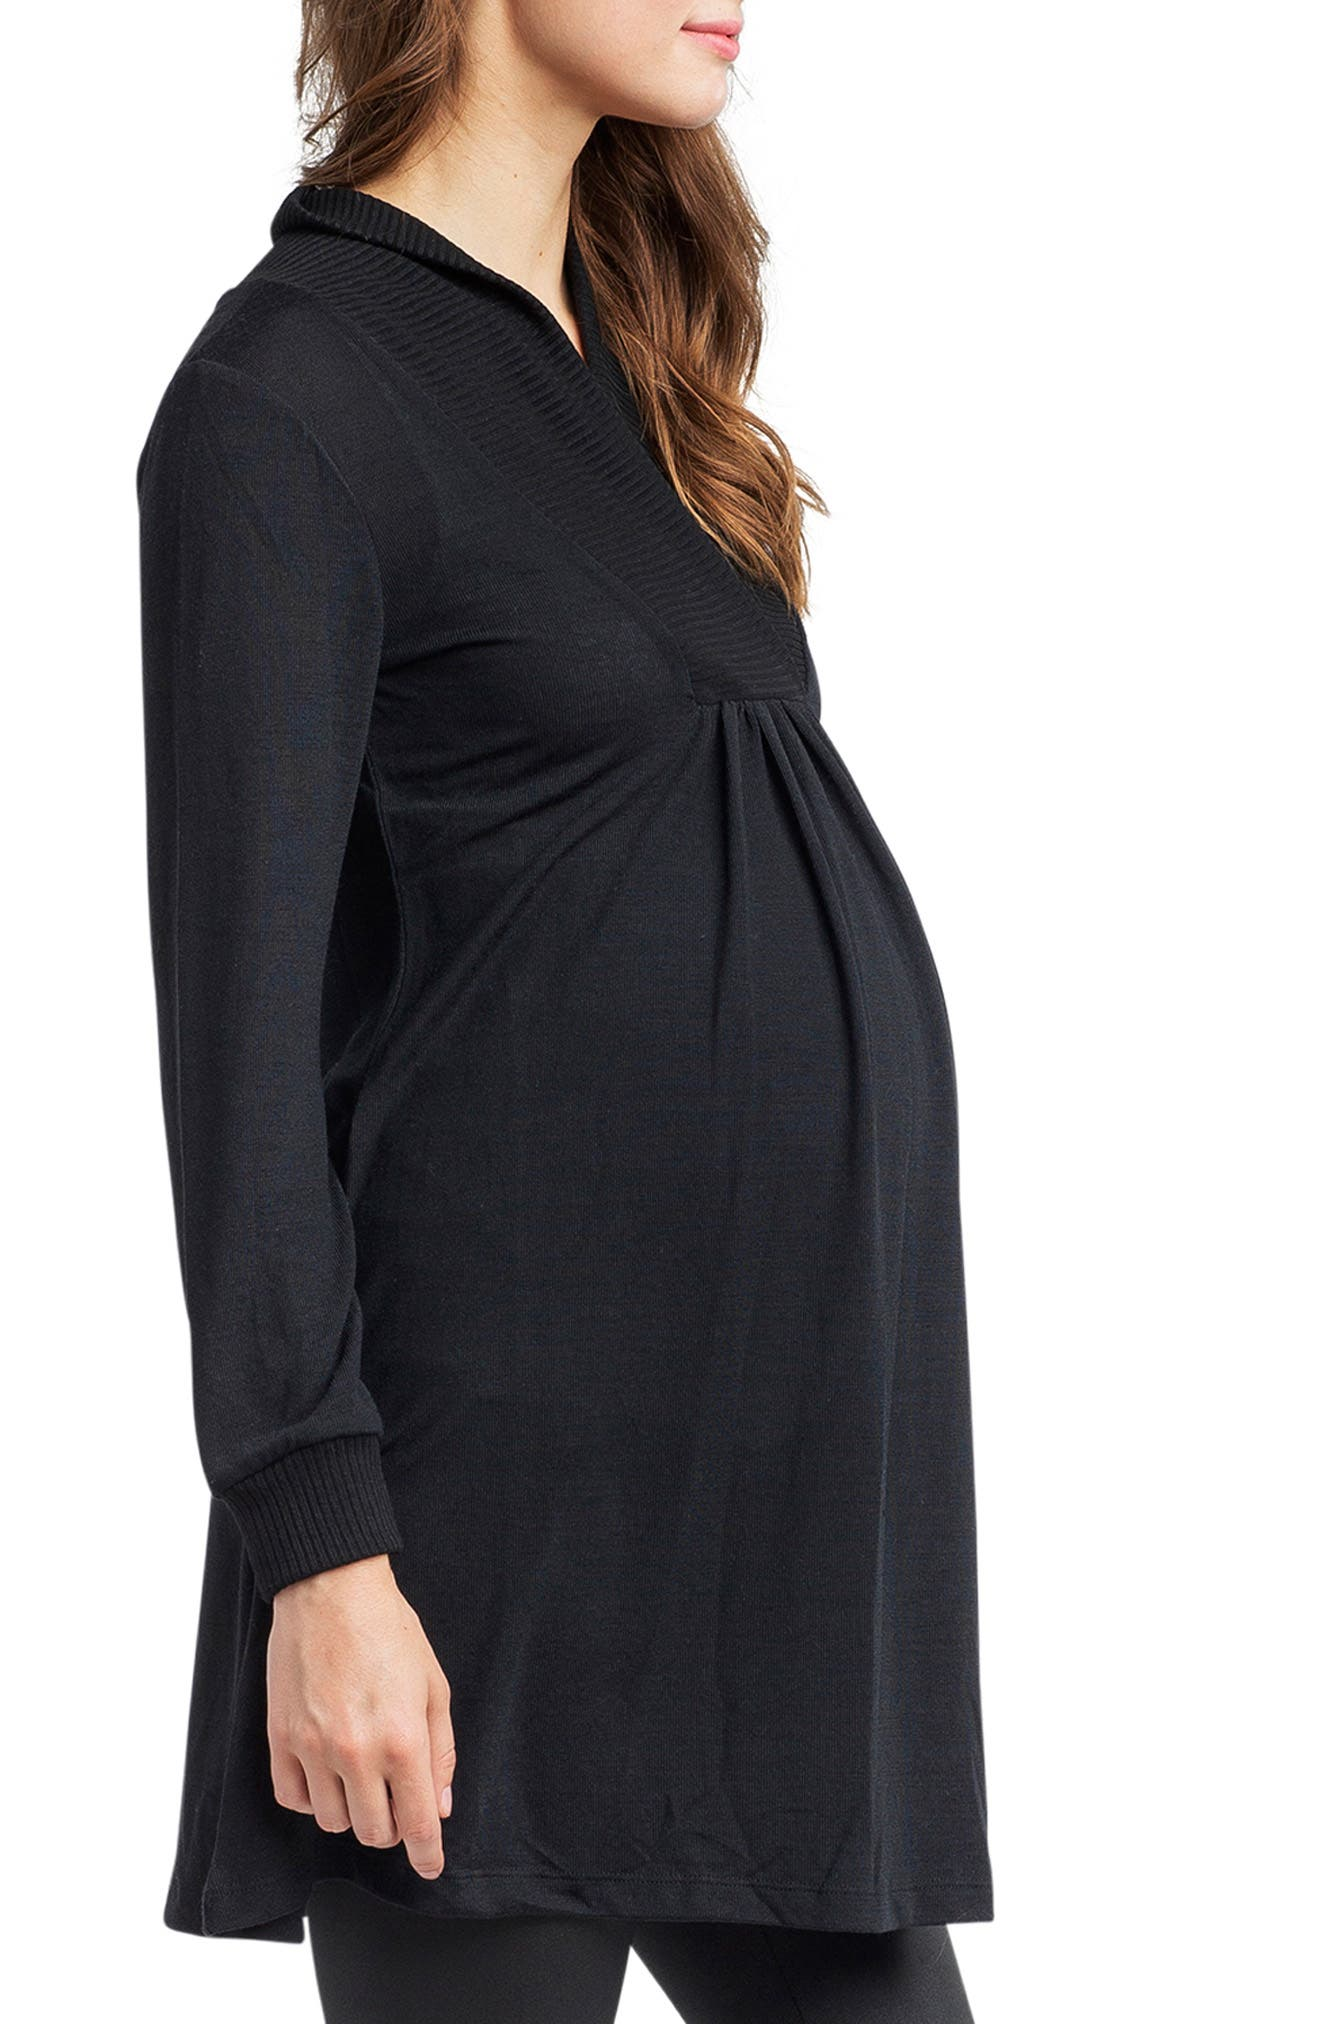 NOM MATERNITY, Tanya Maternity Tunic, Alternate thumbnail 3, color, BLACK